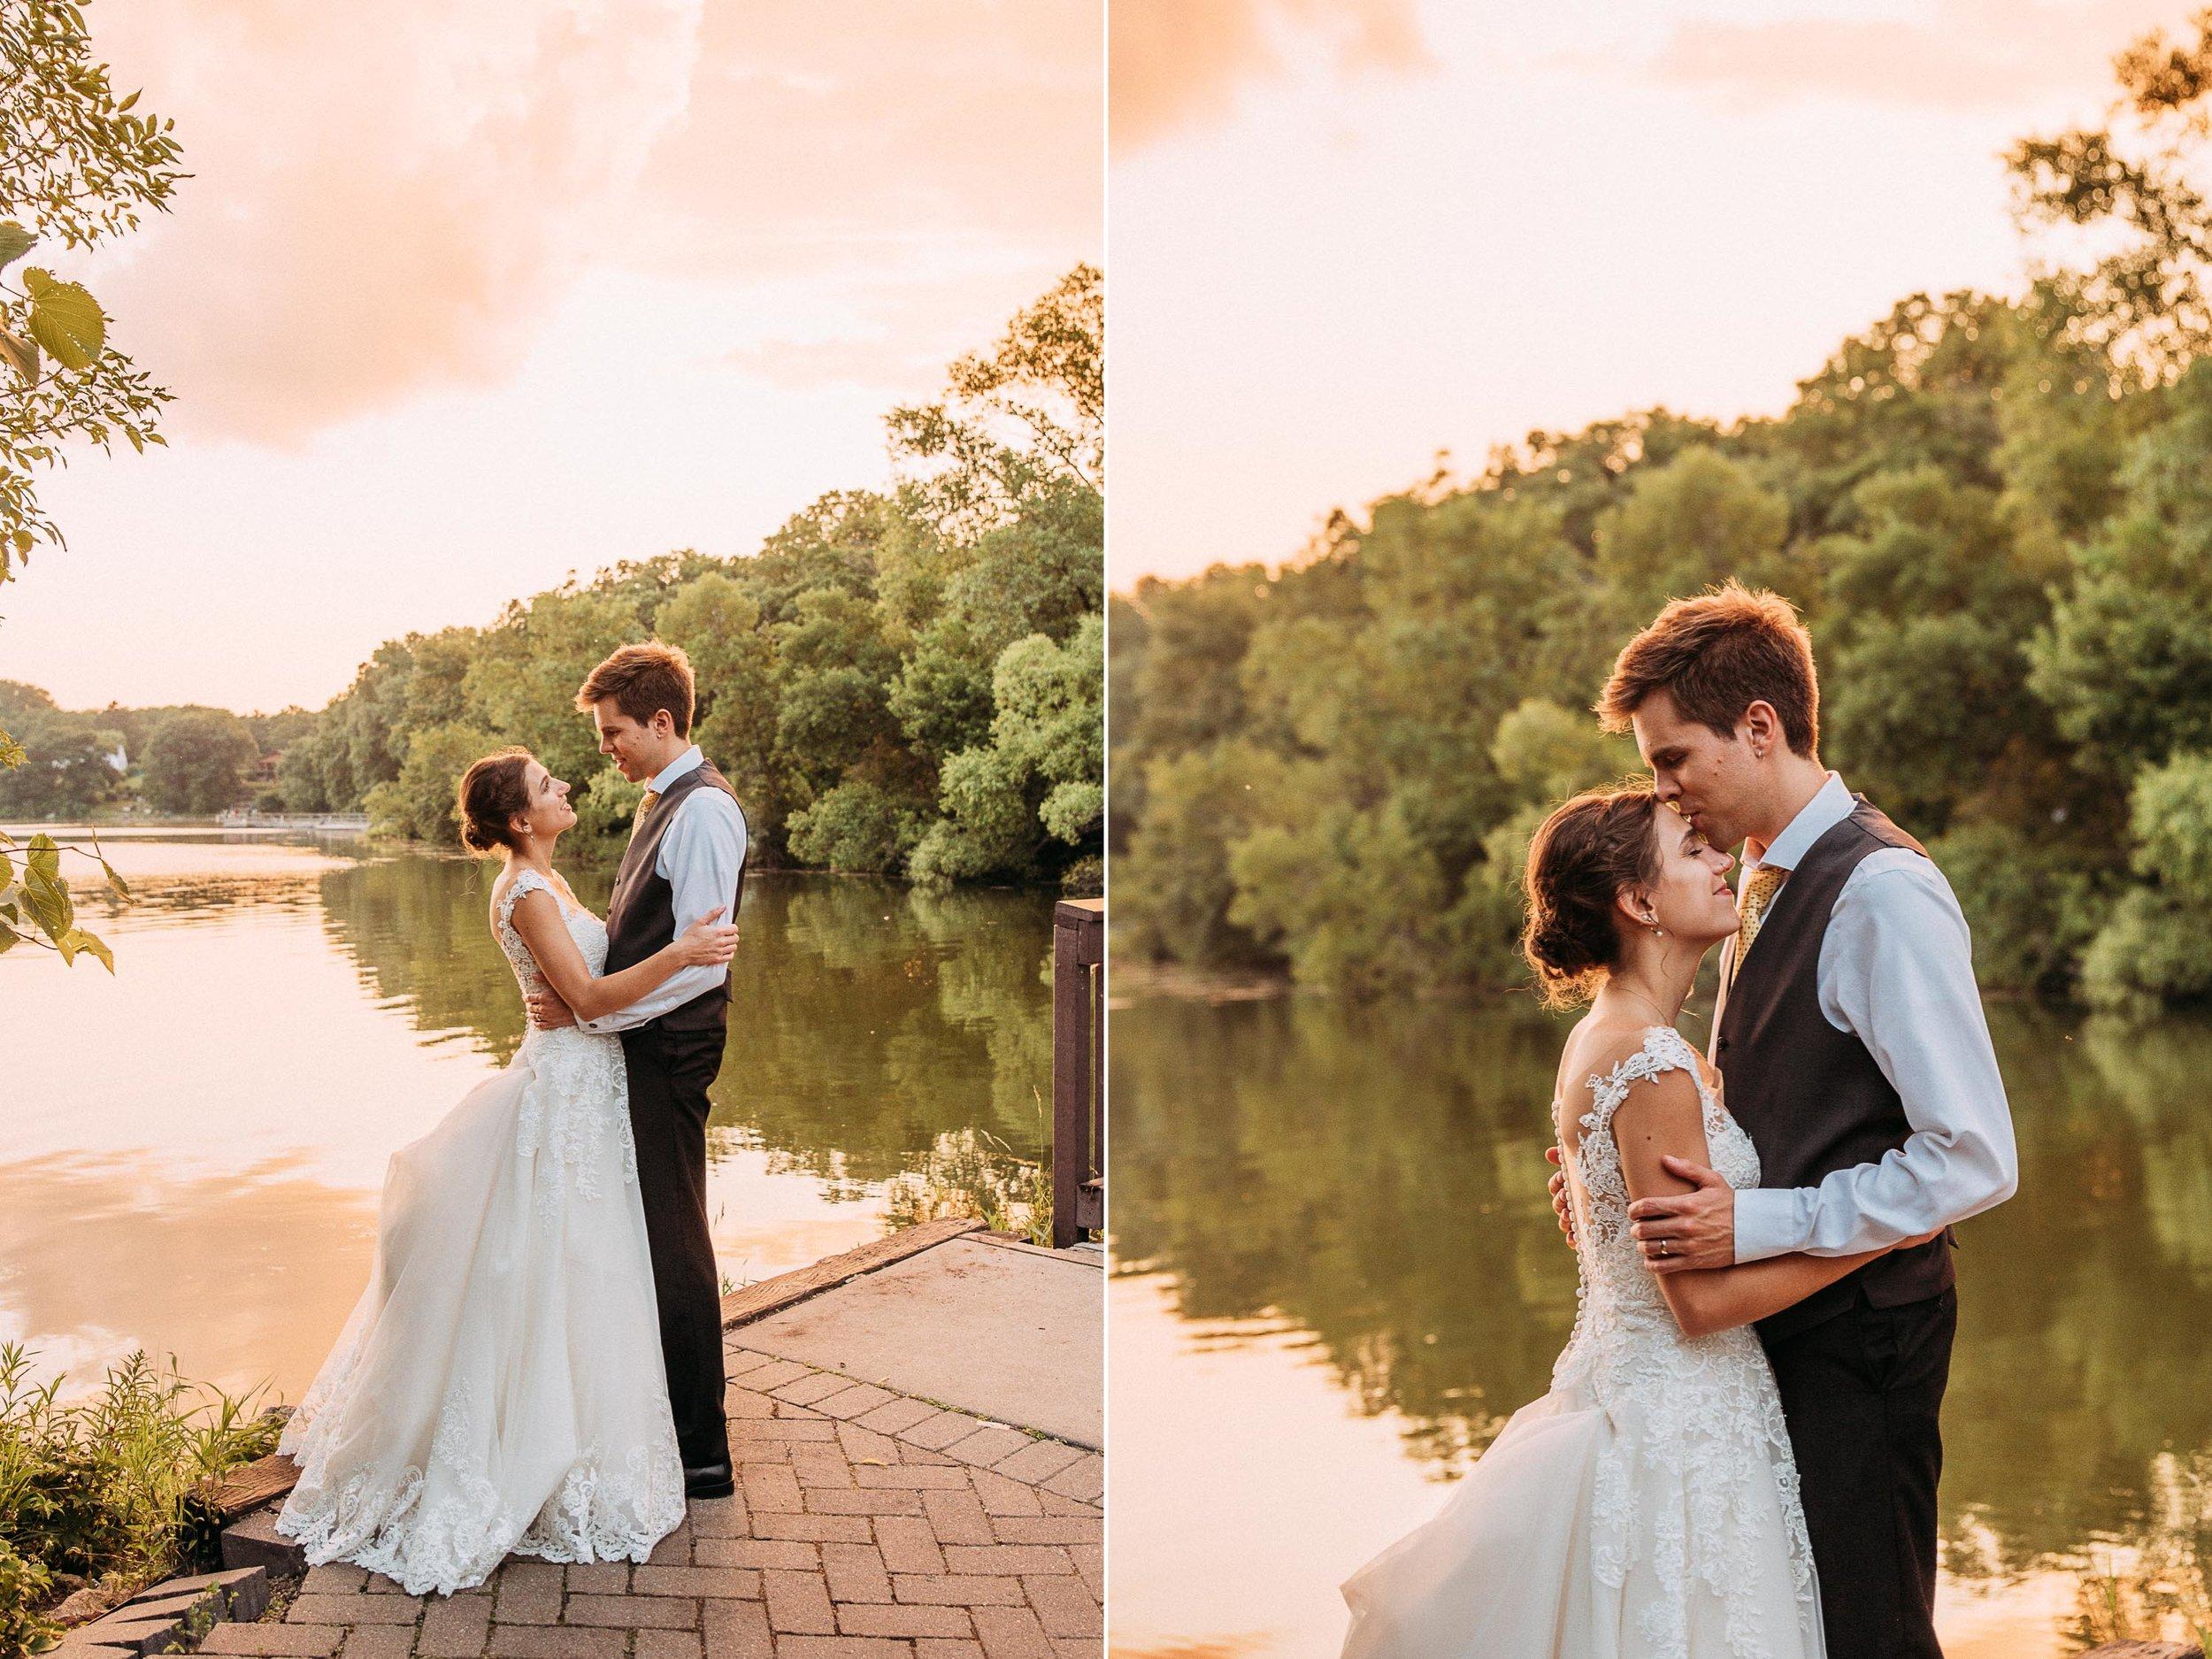 49-Liza_Chris_Minneapolis_Minnesota_Wedding.jpg